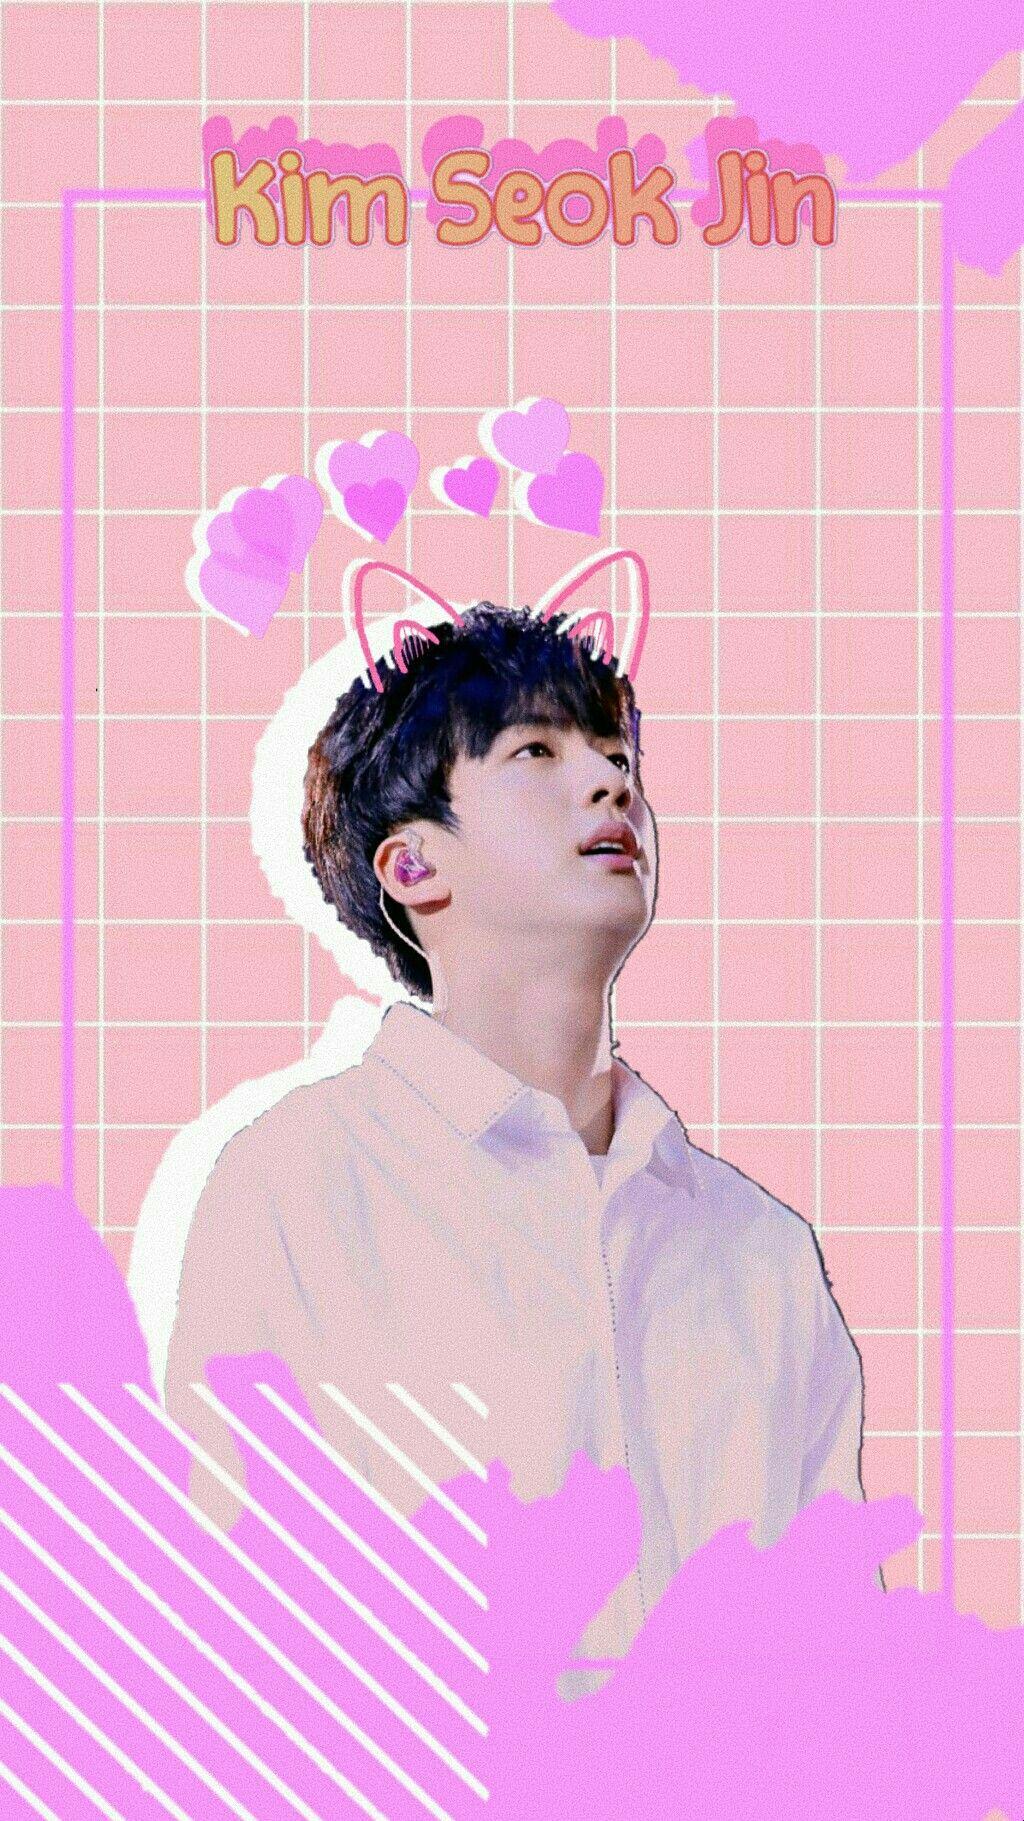 Jin Bts Bts Jin Seokjin Loockschreen Wallpaper